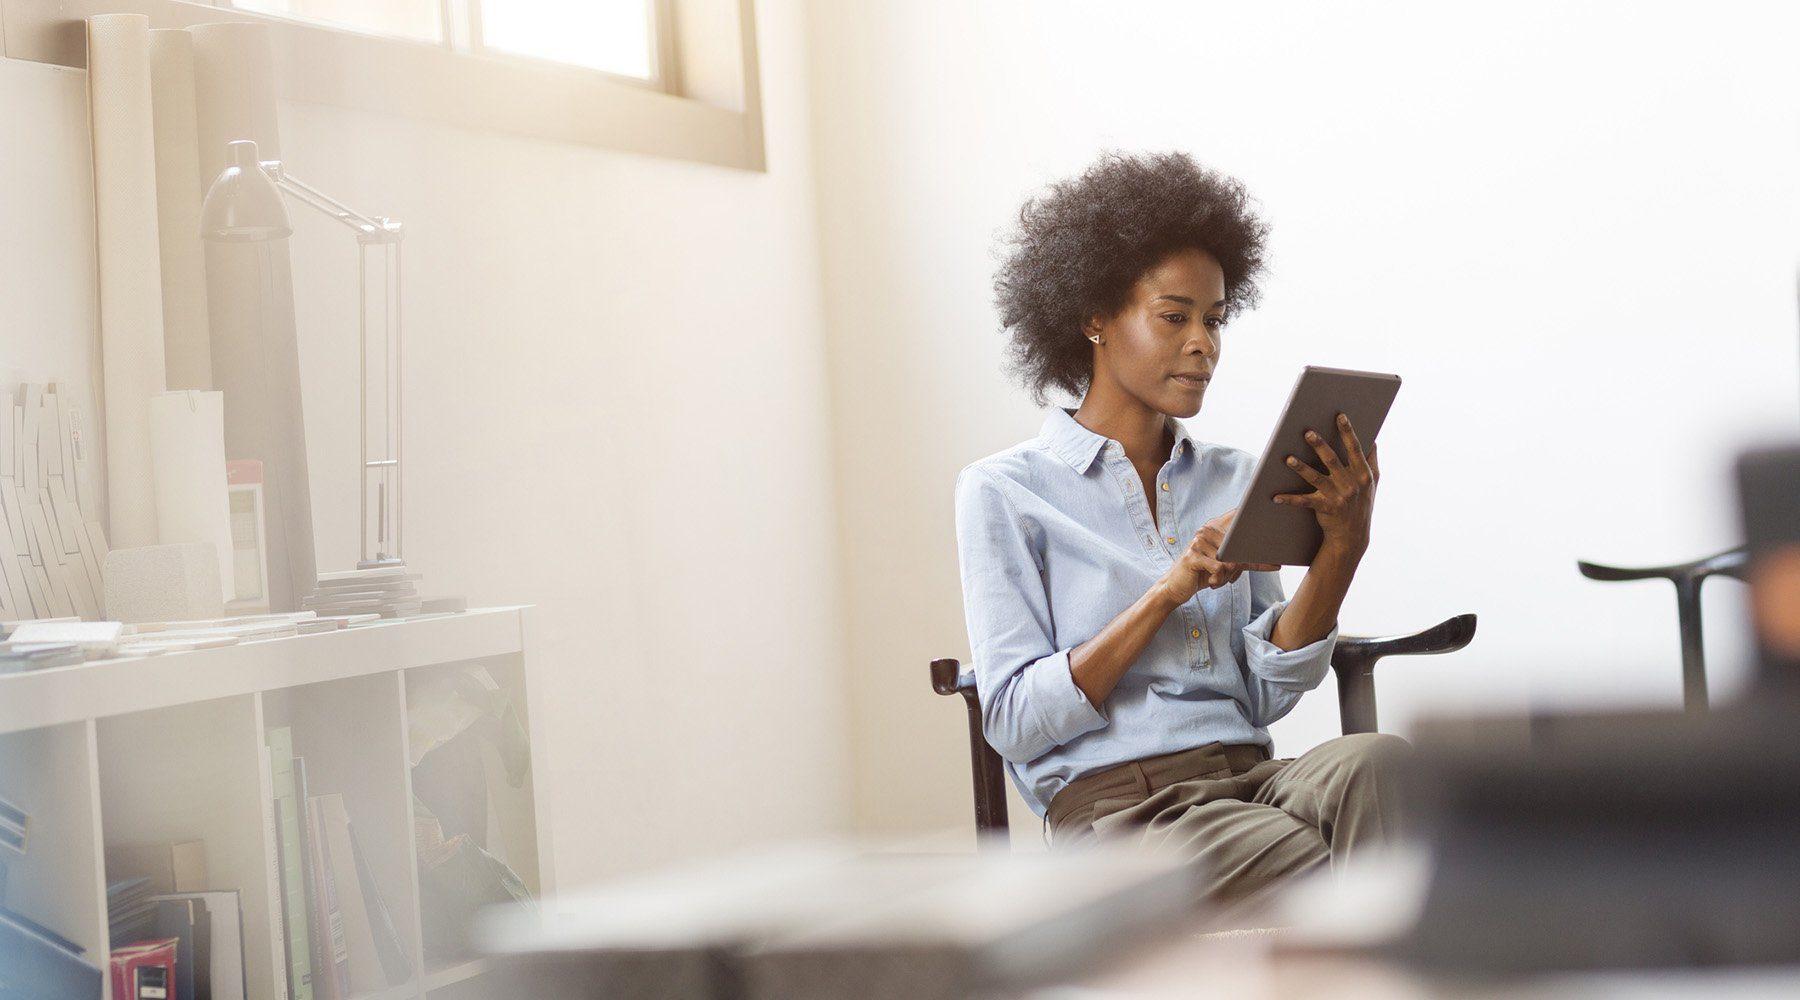 Freelance News, freelance skills, Freelance tips, Freelance Platforms,